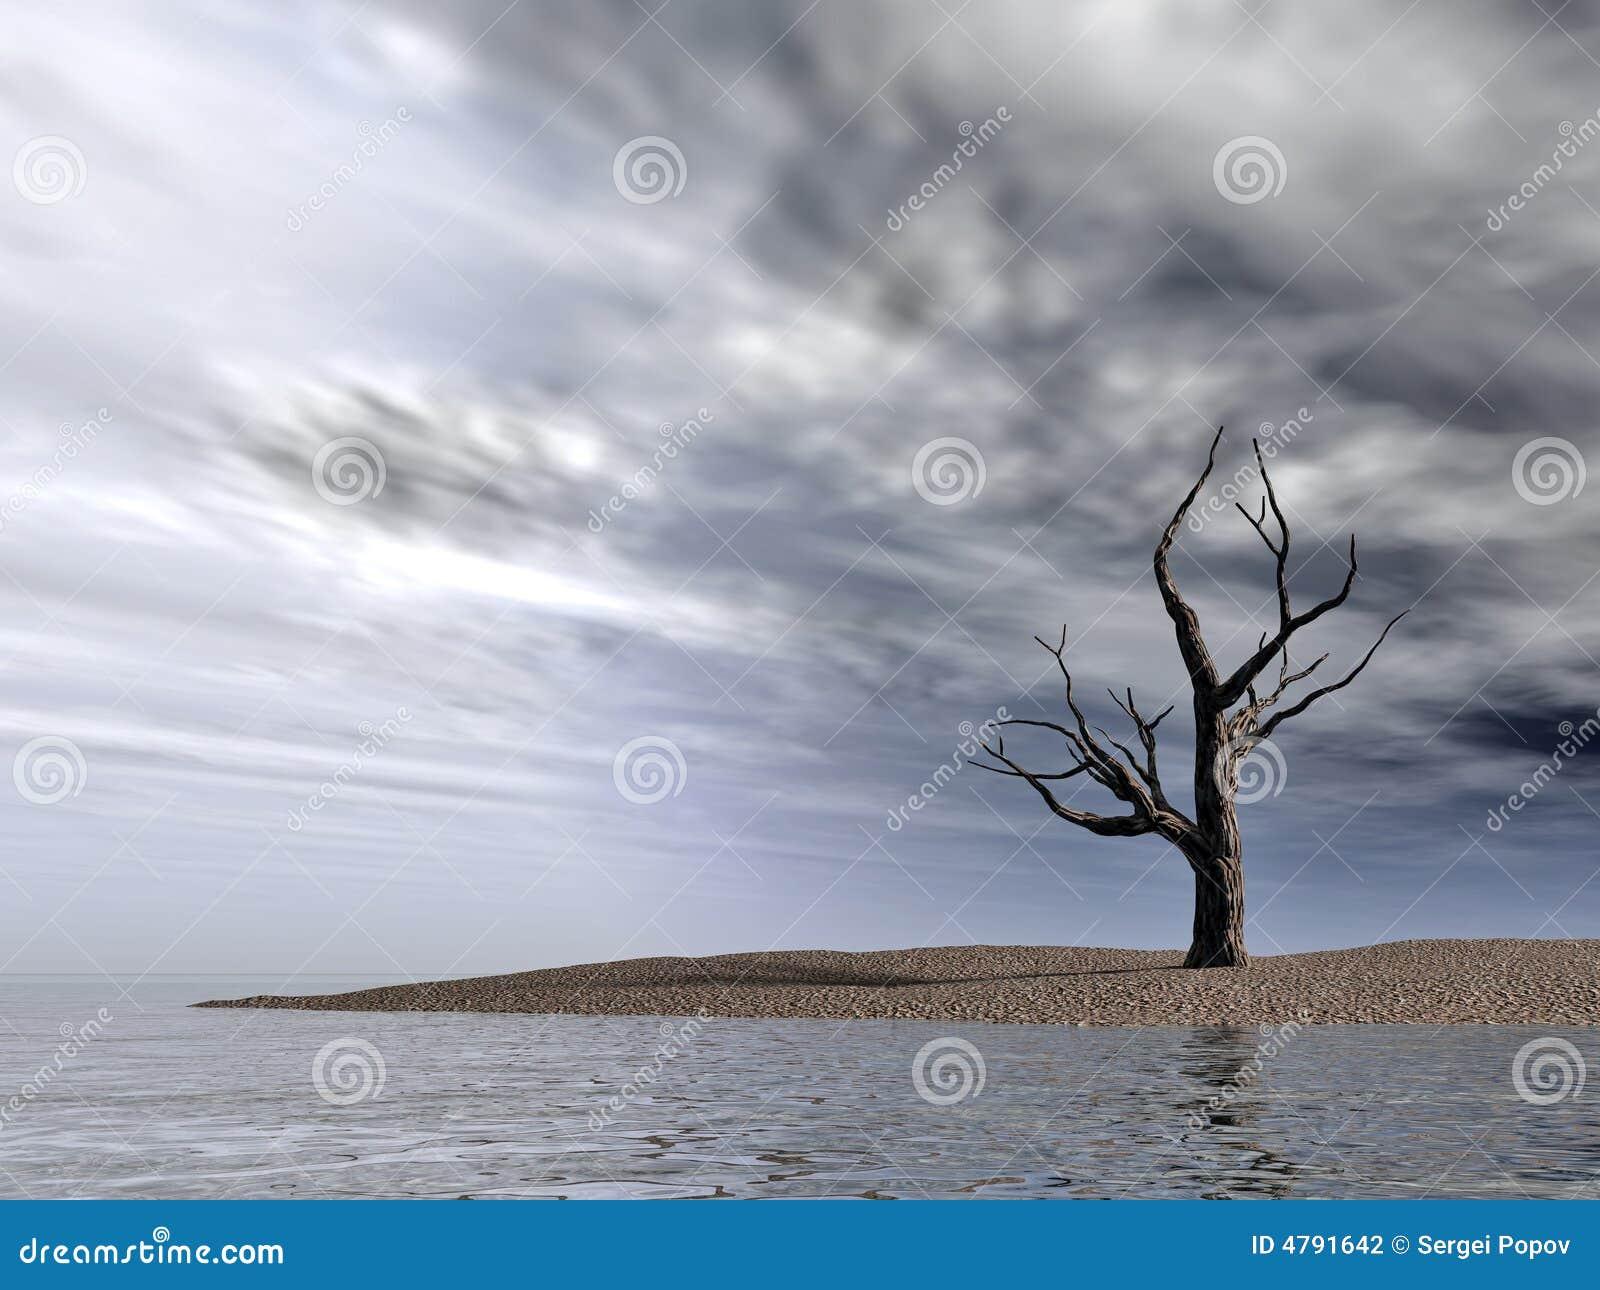 Dead naked tree